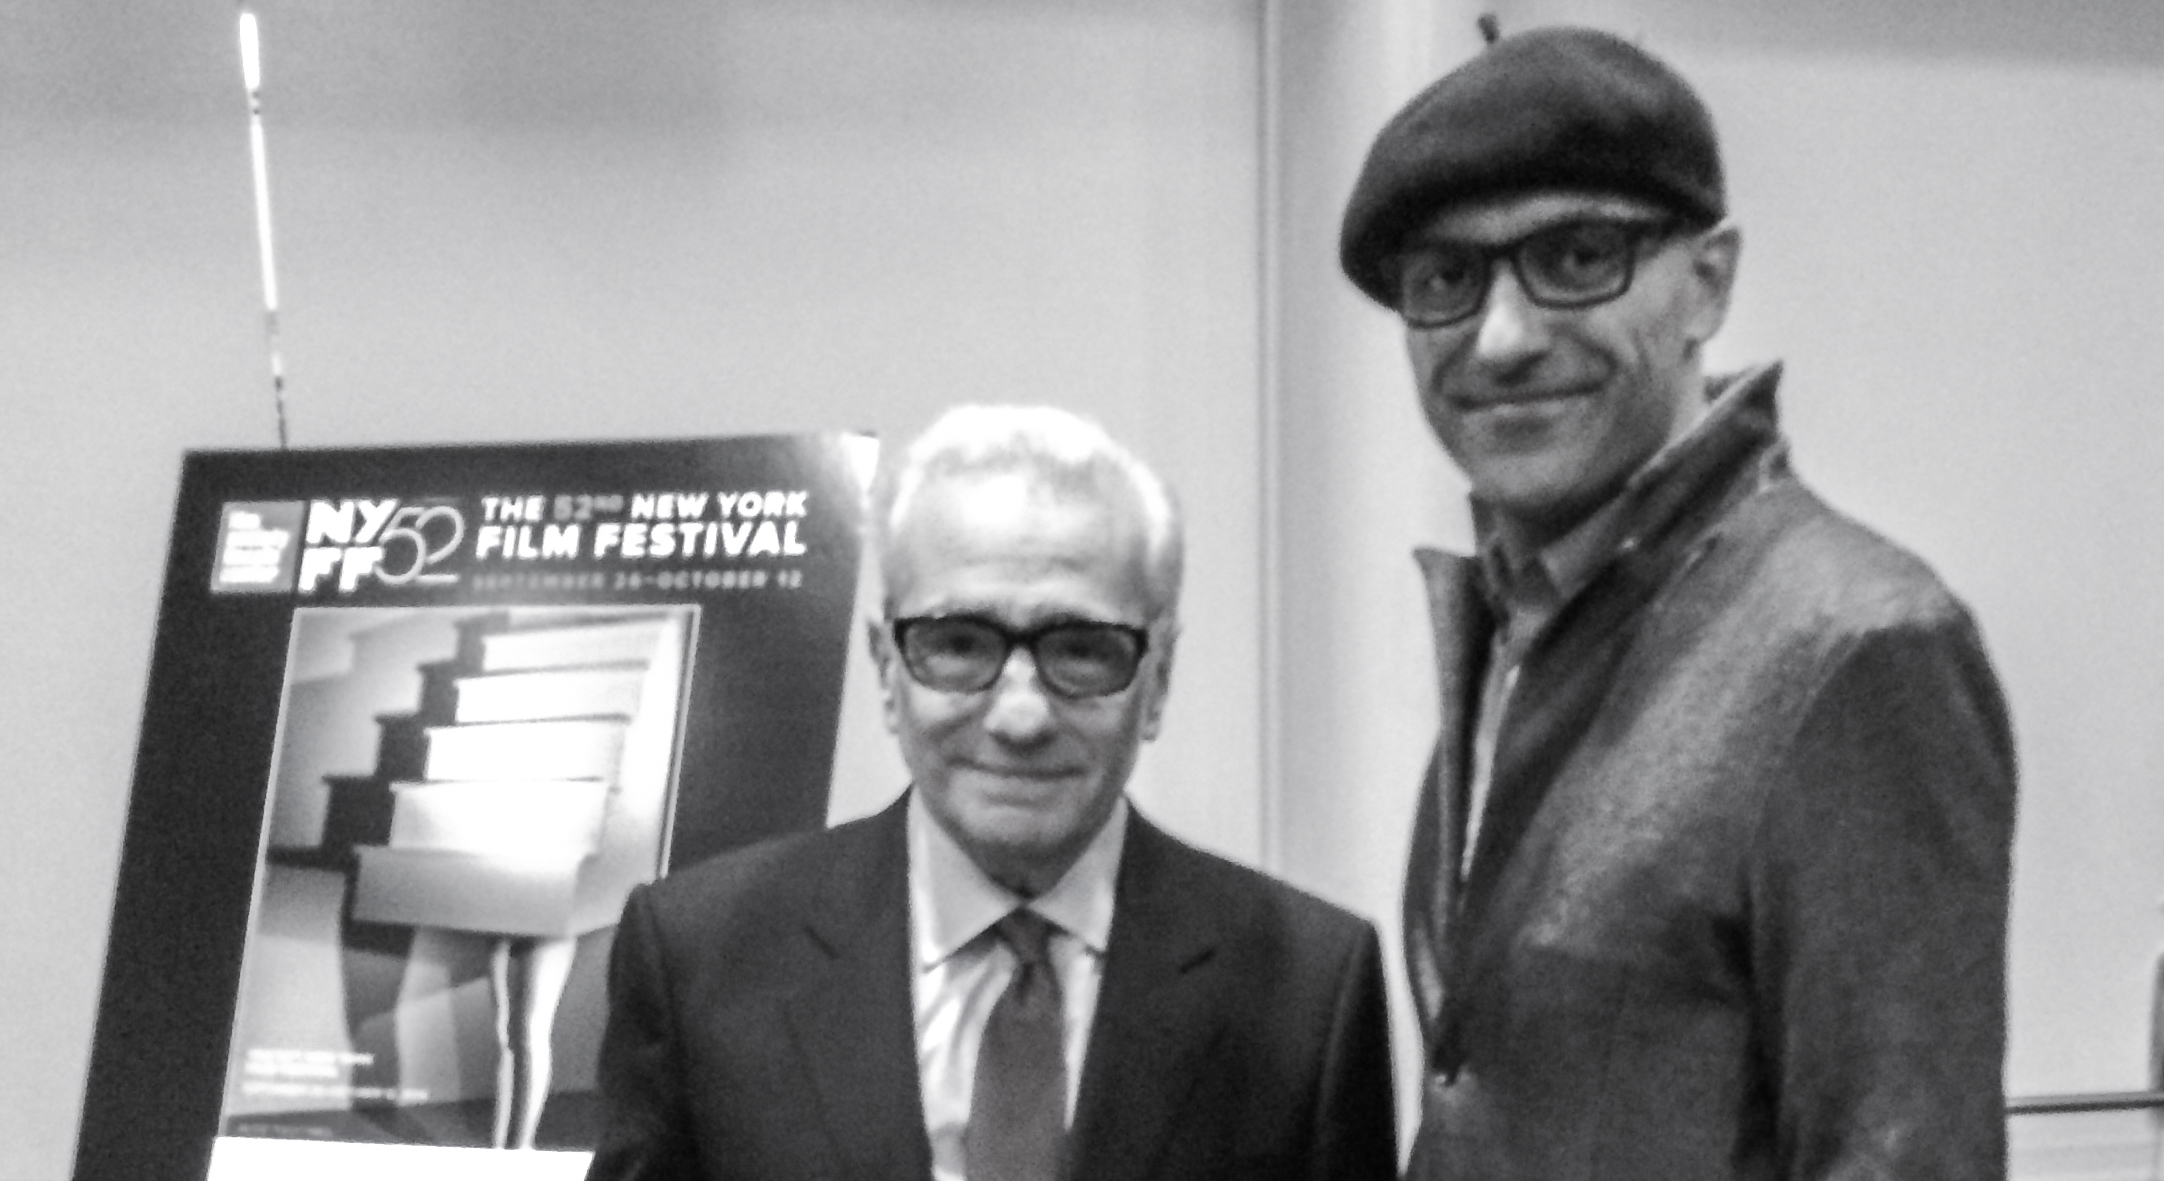 Martin Scorsese receives the 2014 Parajanov-Vartanov Institute A